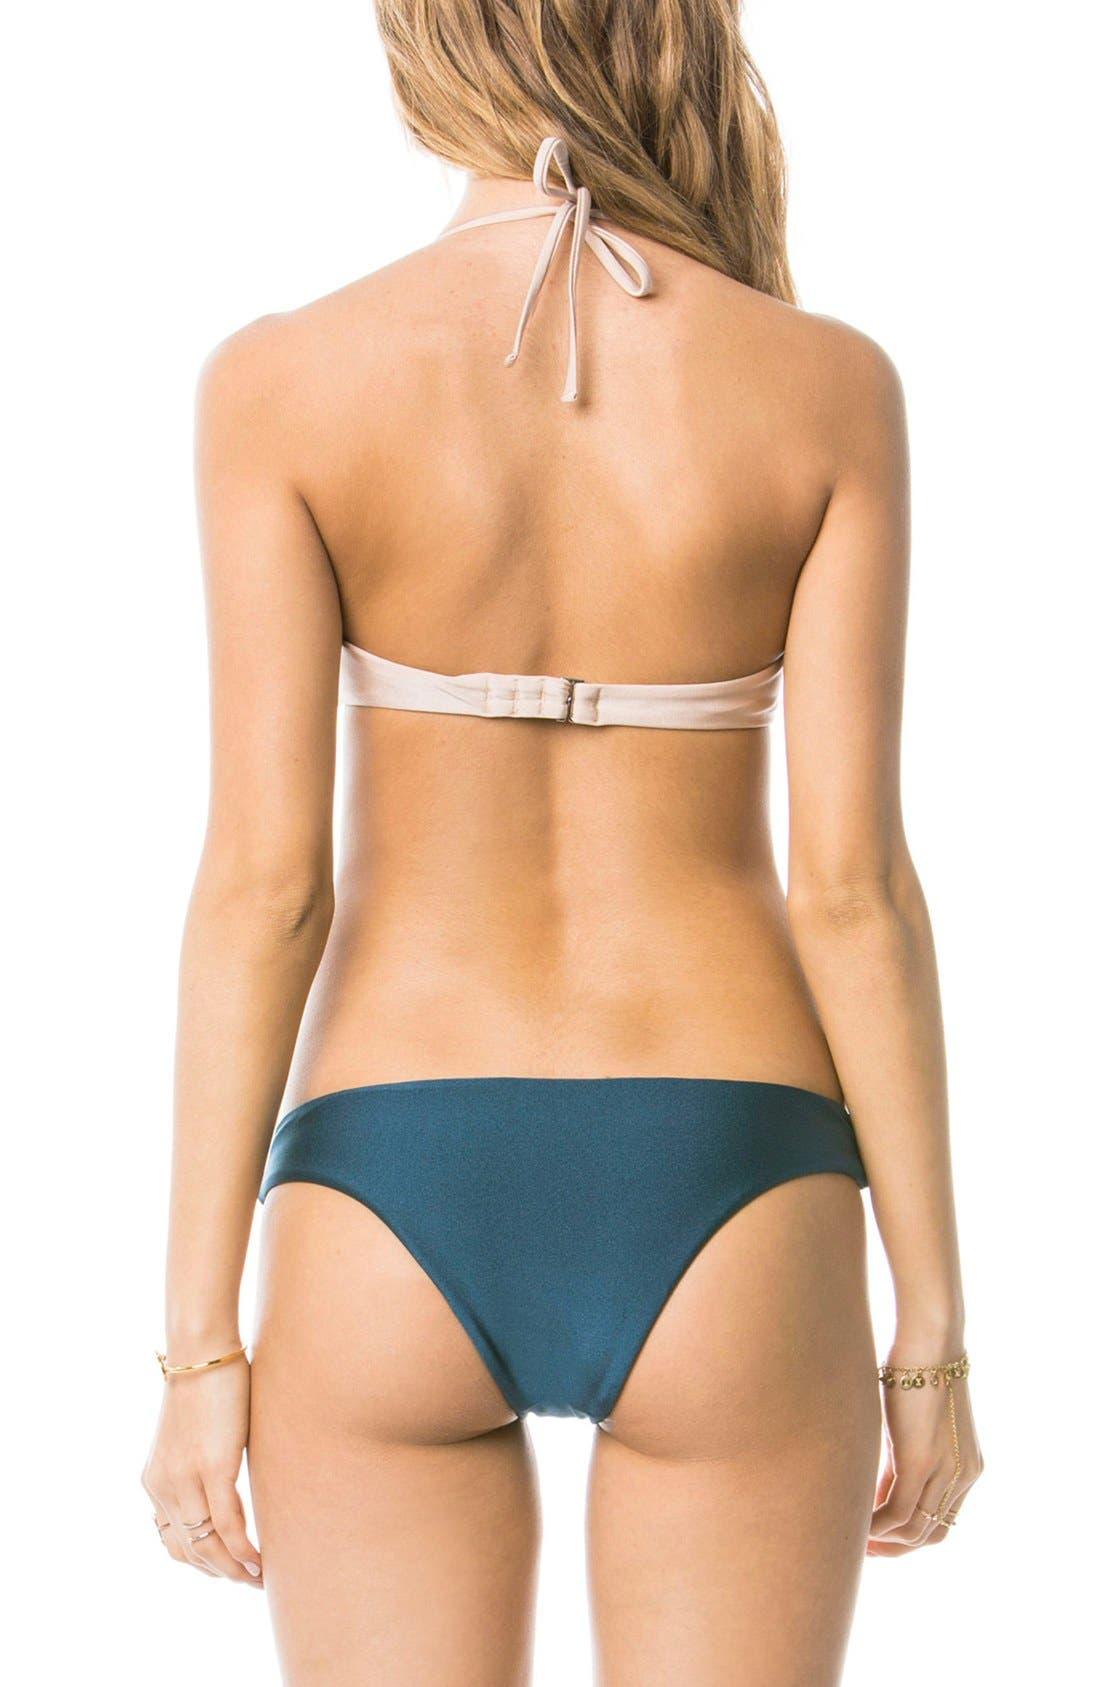 Alternate Image 2  - Amuse Society 'Elissa' Colorblock Bralette Bikini Top